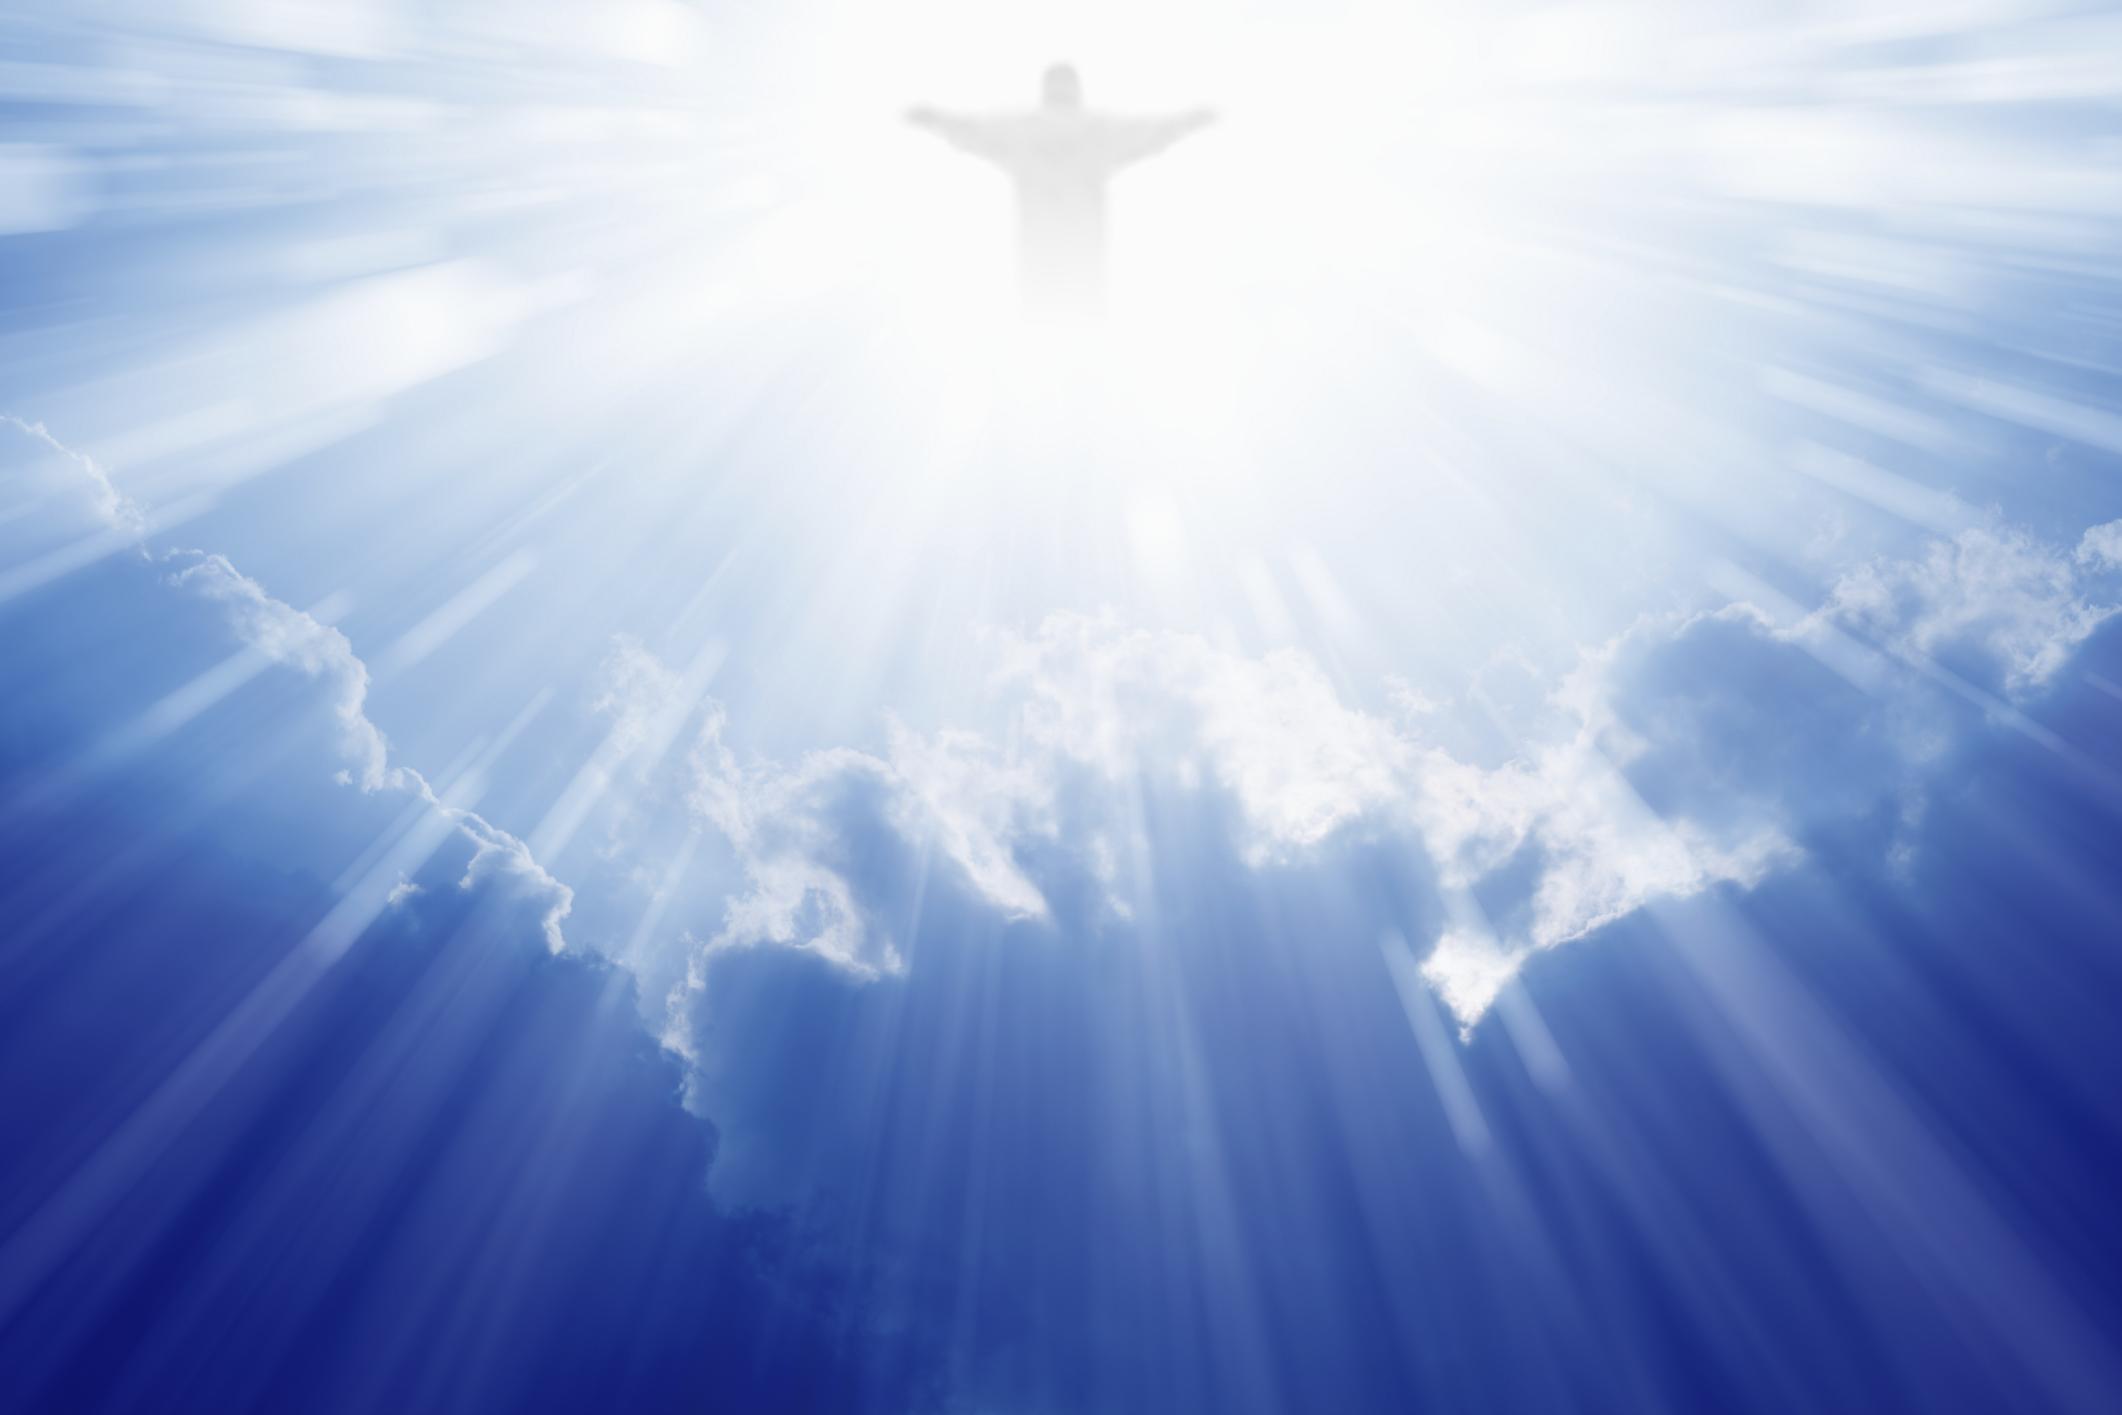 My star in heaven poem